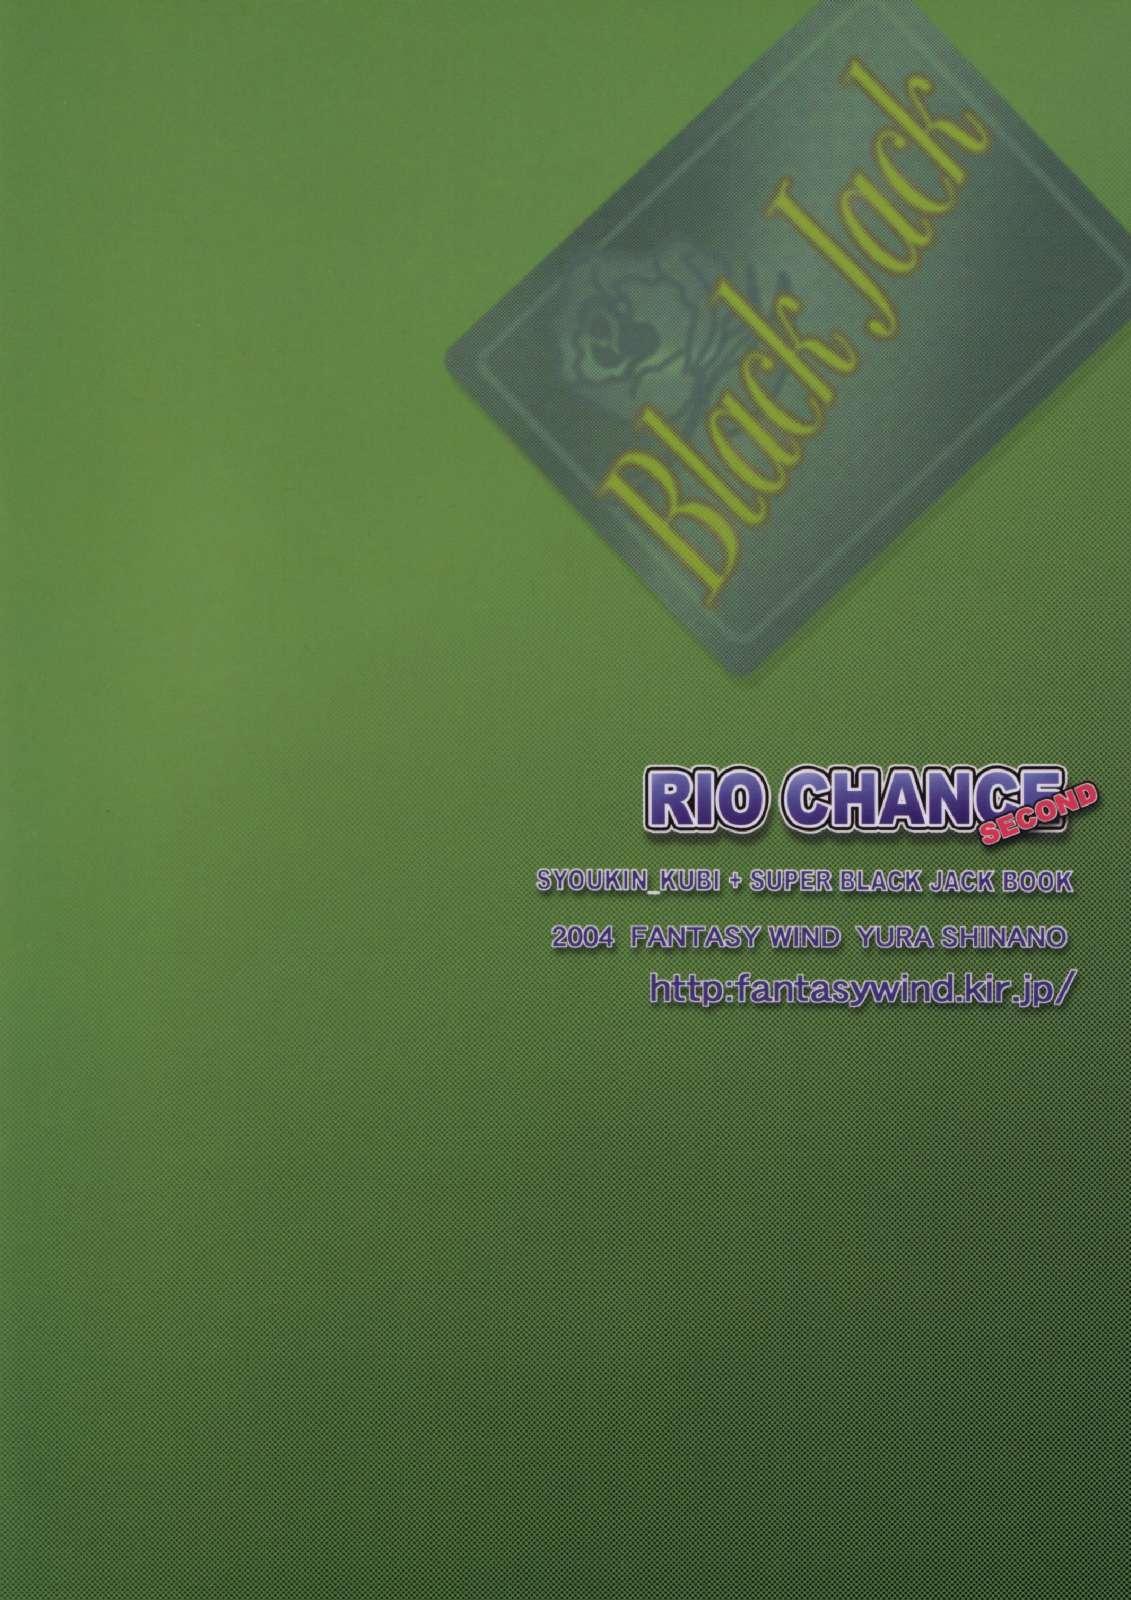 RIO CHANCE SECOND 1